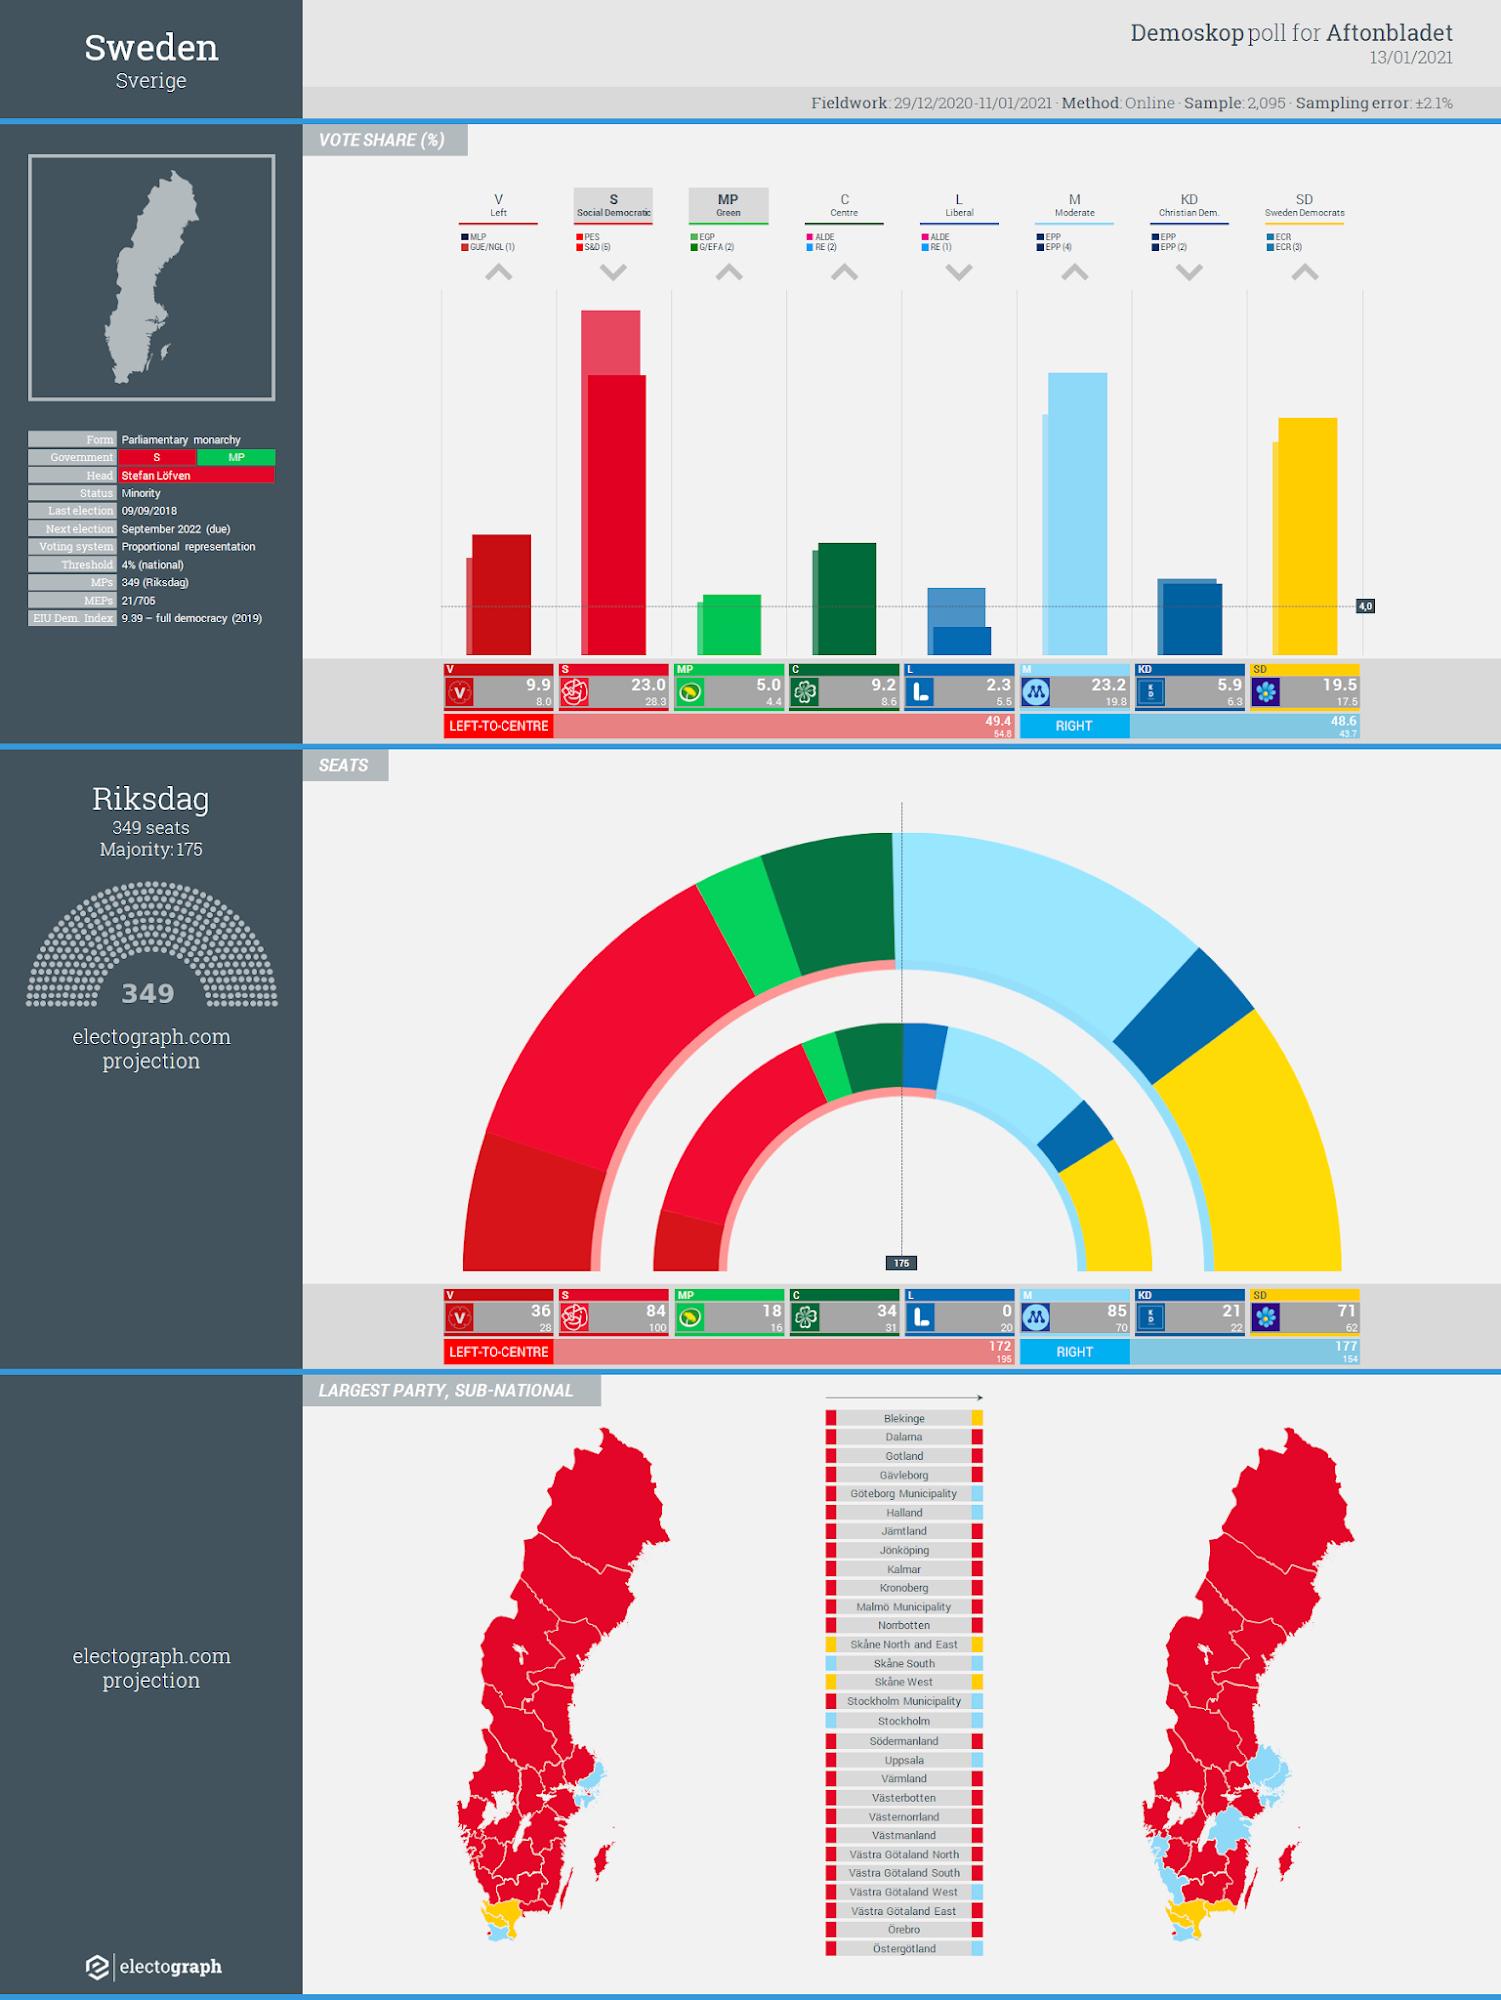 SWEDEN: Demoskop poll chart for Aftonbladet, 13 January 2021